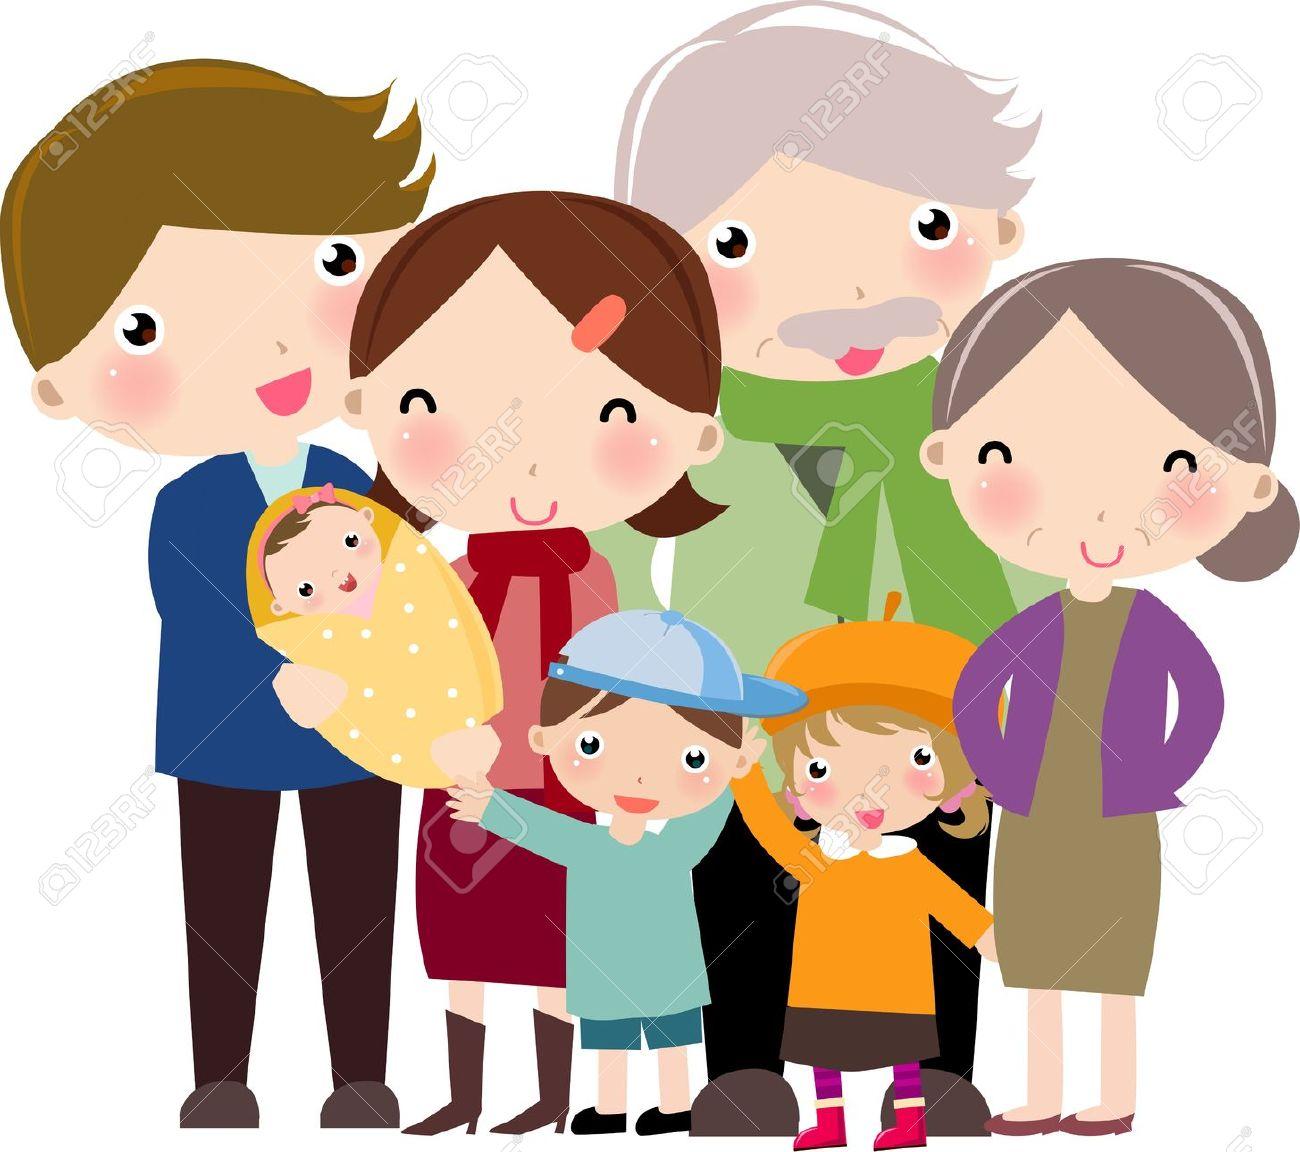 Family Clipart-family clipart-6